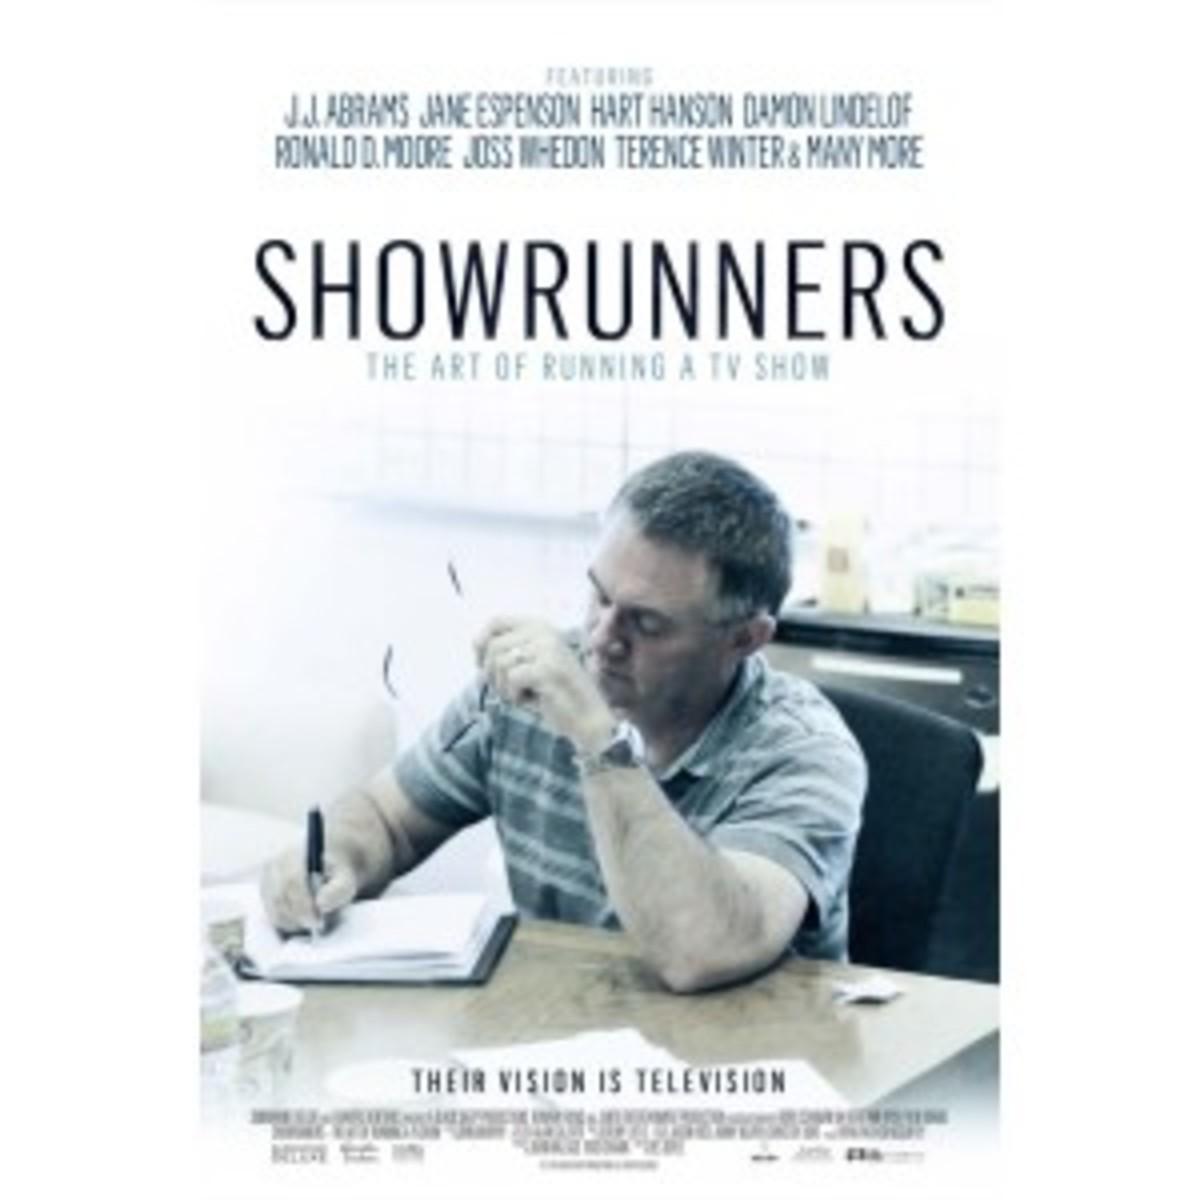 Showrunners_i-Tunes_Art_2.psd